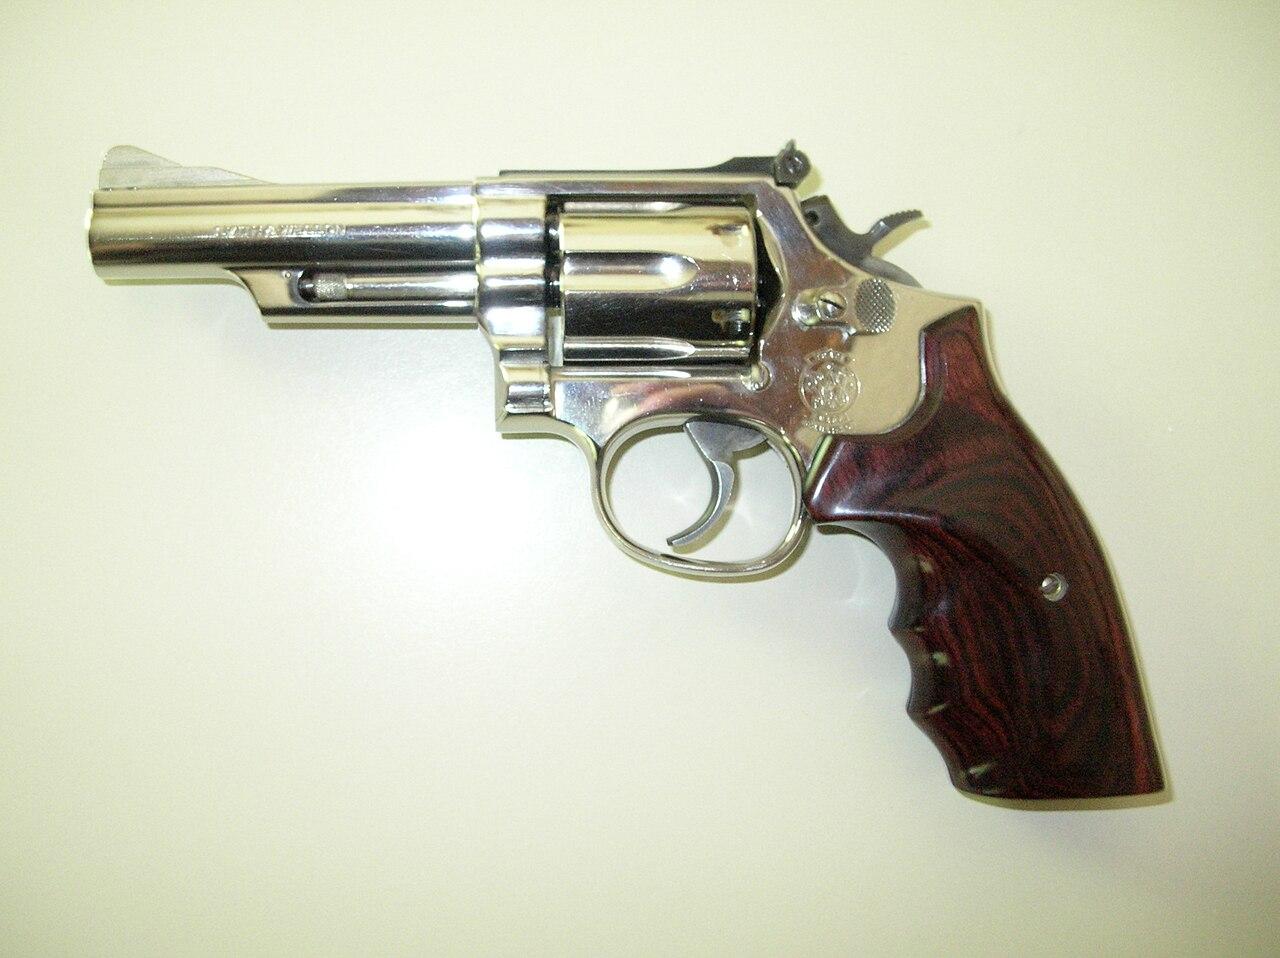 S&W Model 19-5 .357 Magnum.JPG